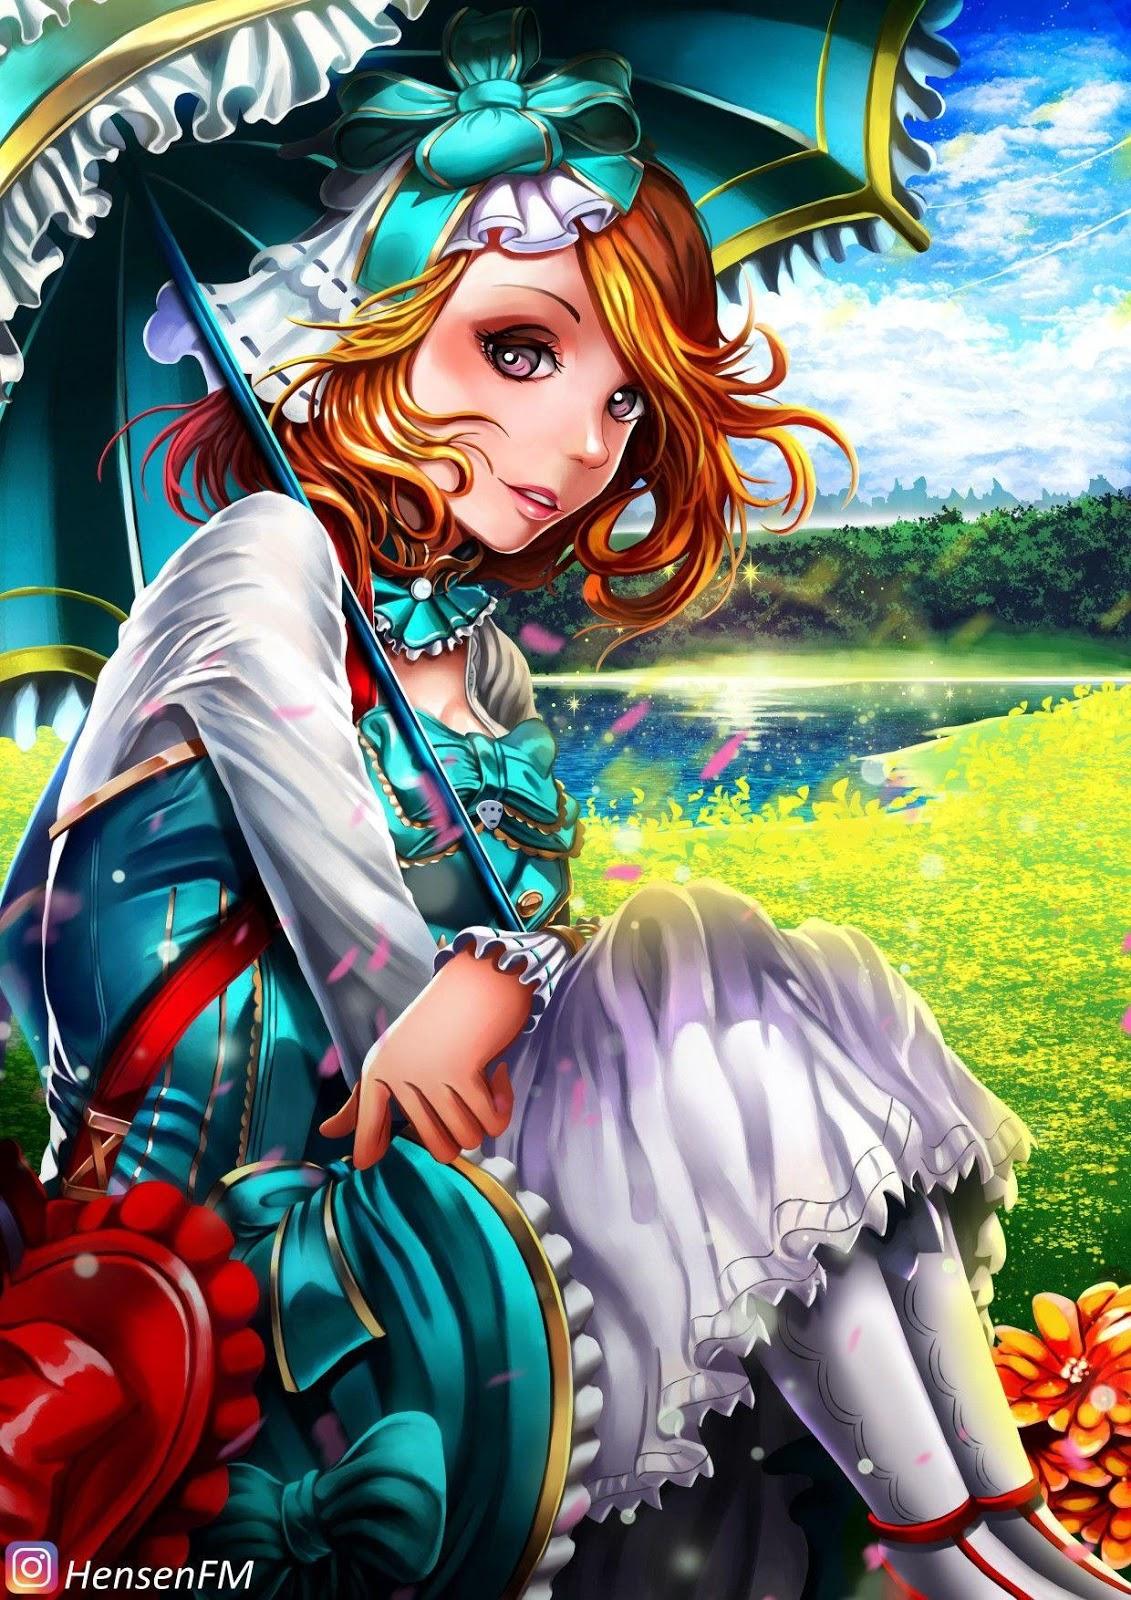 Wallpaper Kagura Flower Season Skin Mobile Legends Full HD for Android and iOS